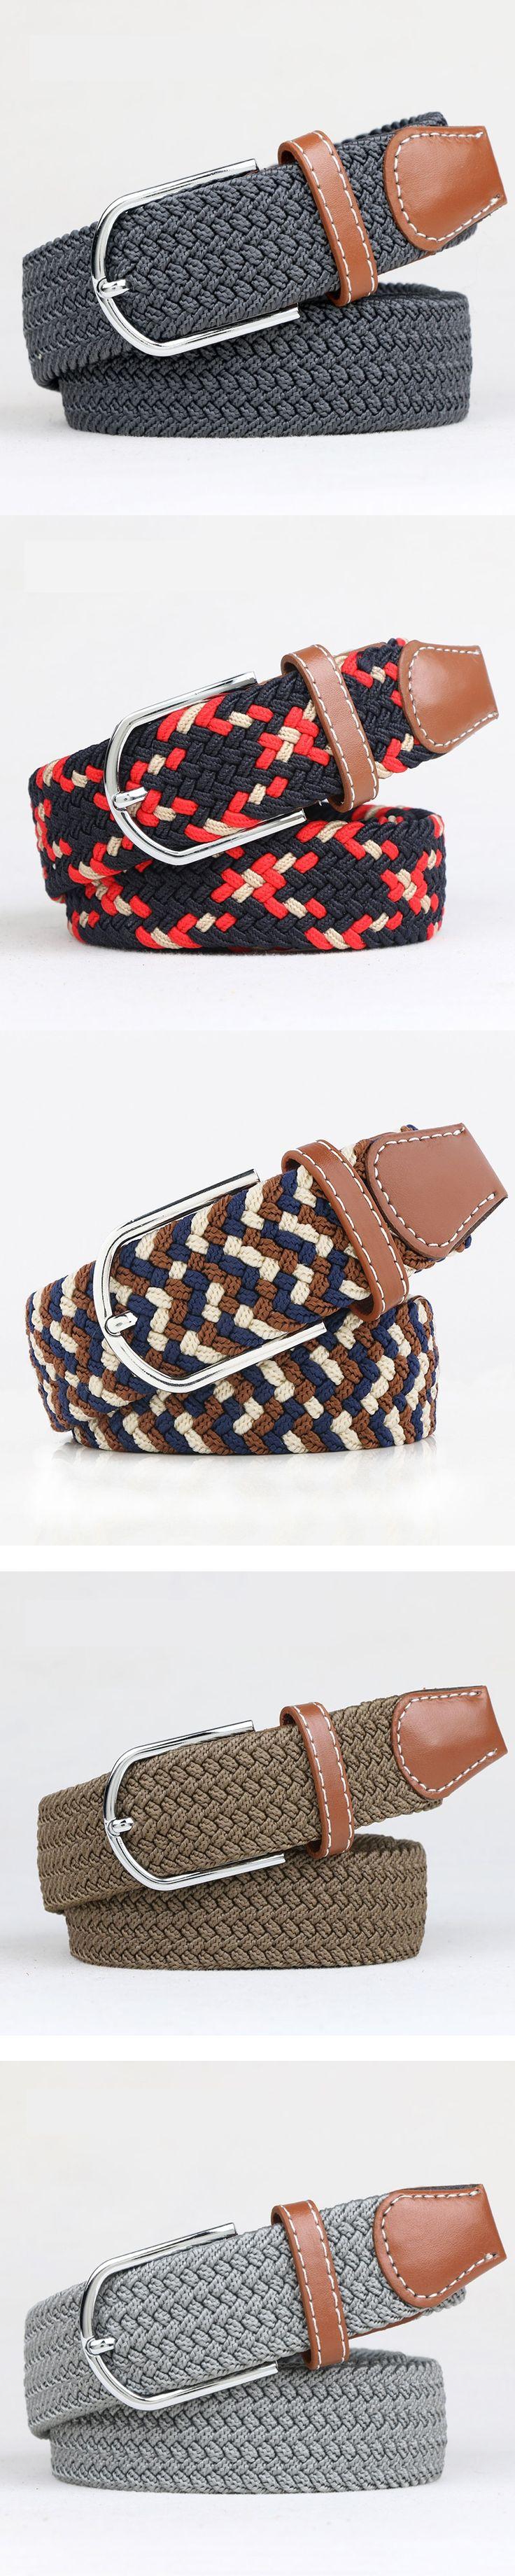 Width 3.3cm Men's and Women's Pin Buckle Elastic Canvas Woven Belts Unisex waistband All-match fashion belts Knitted canvas belt